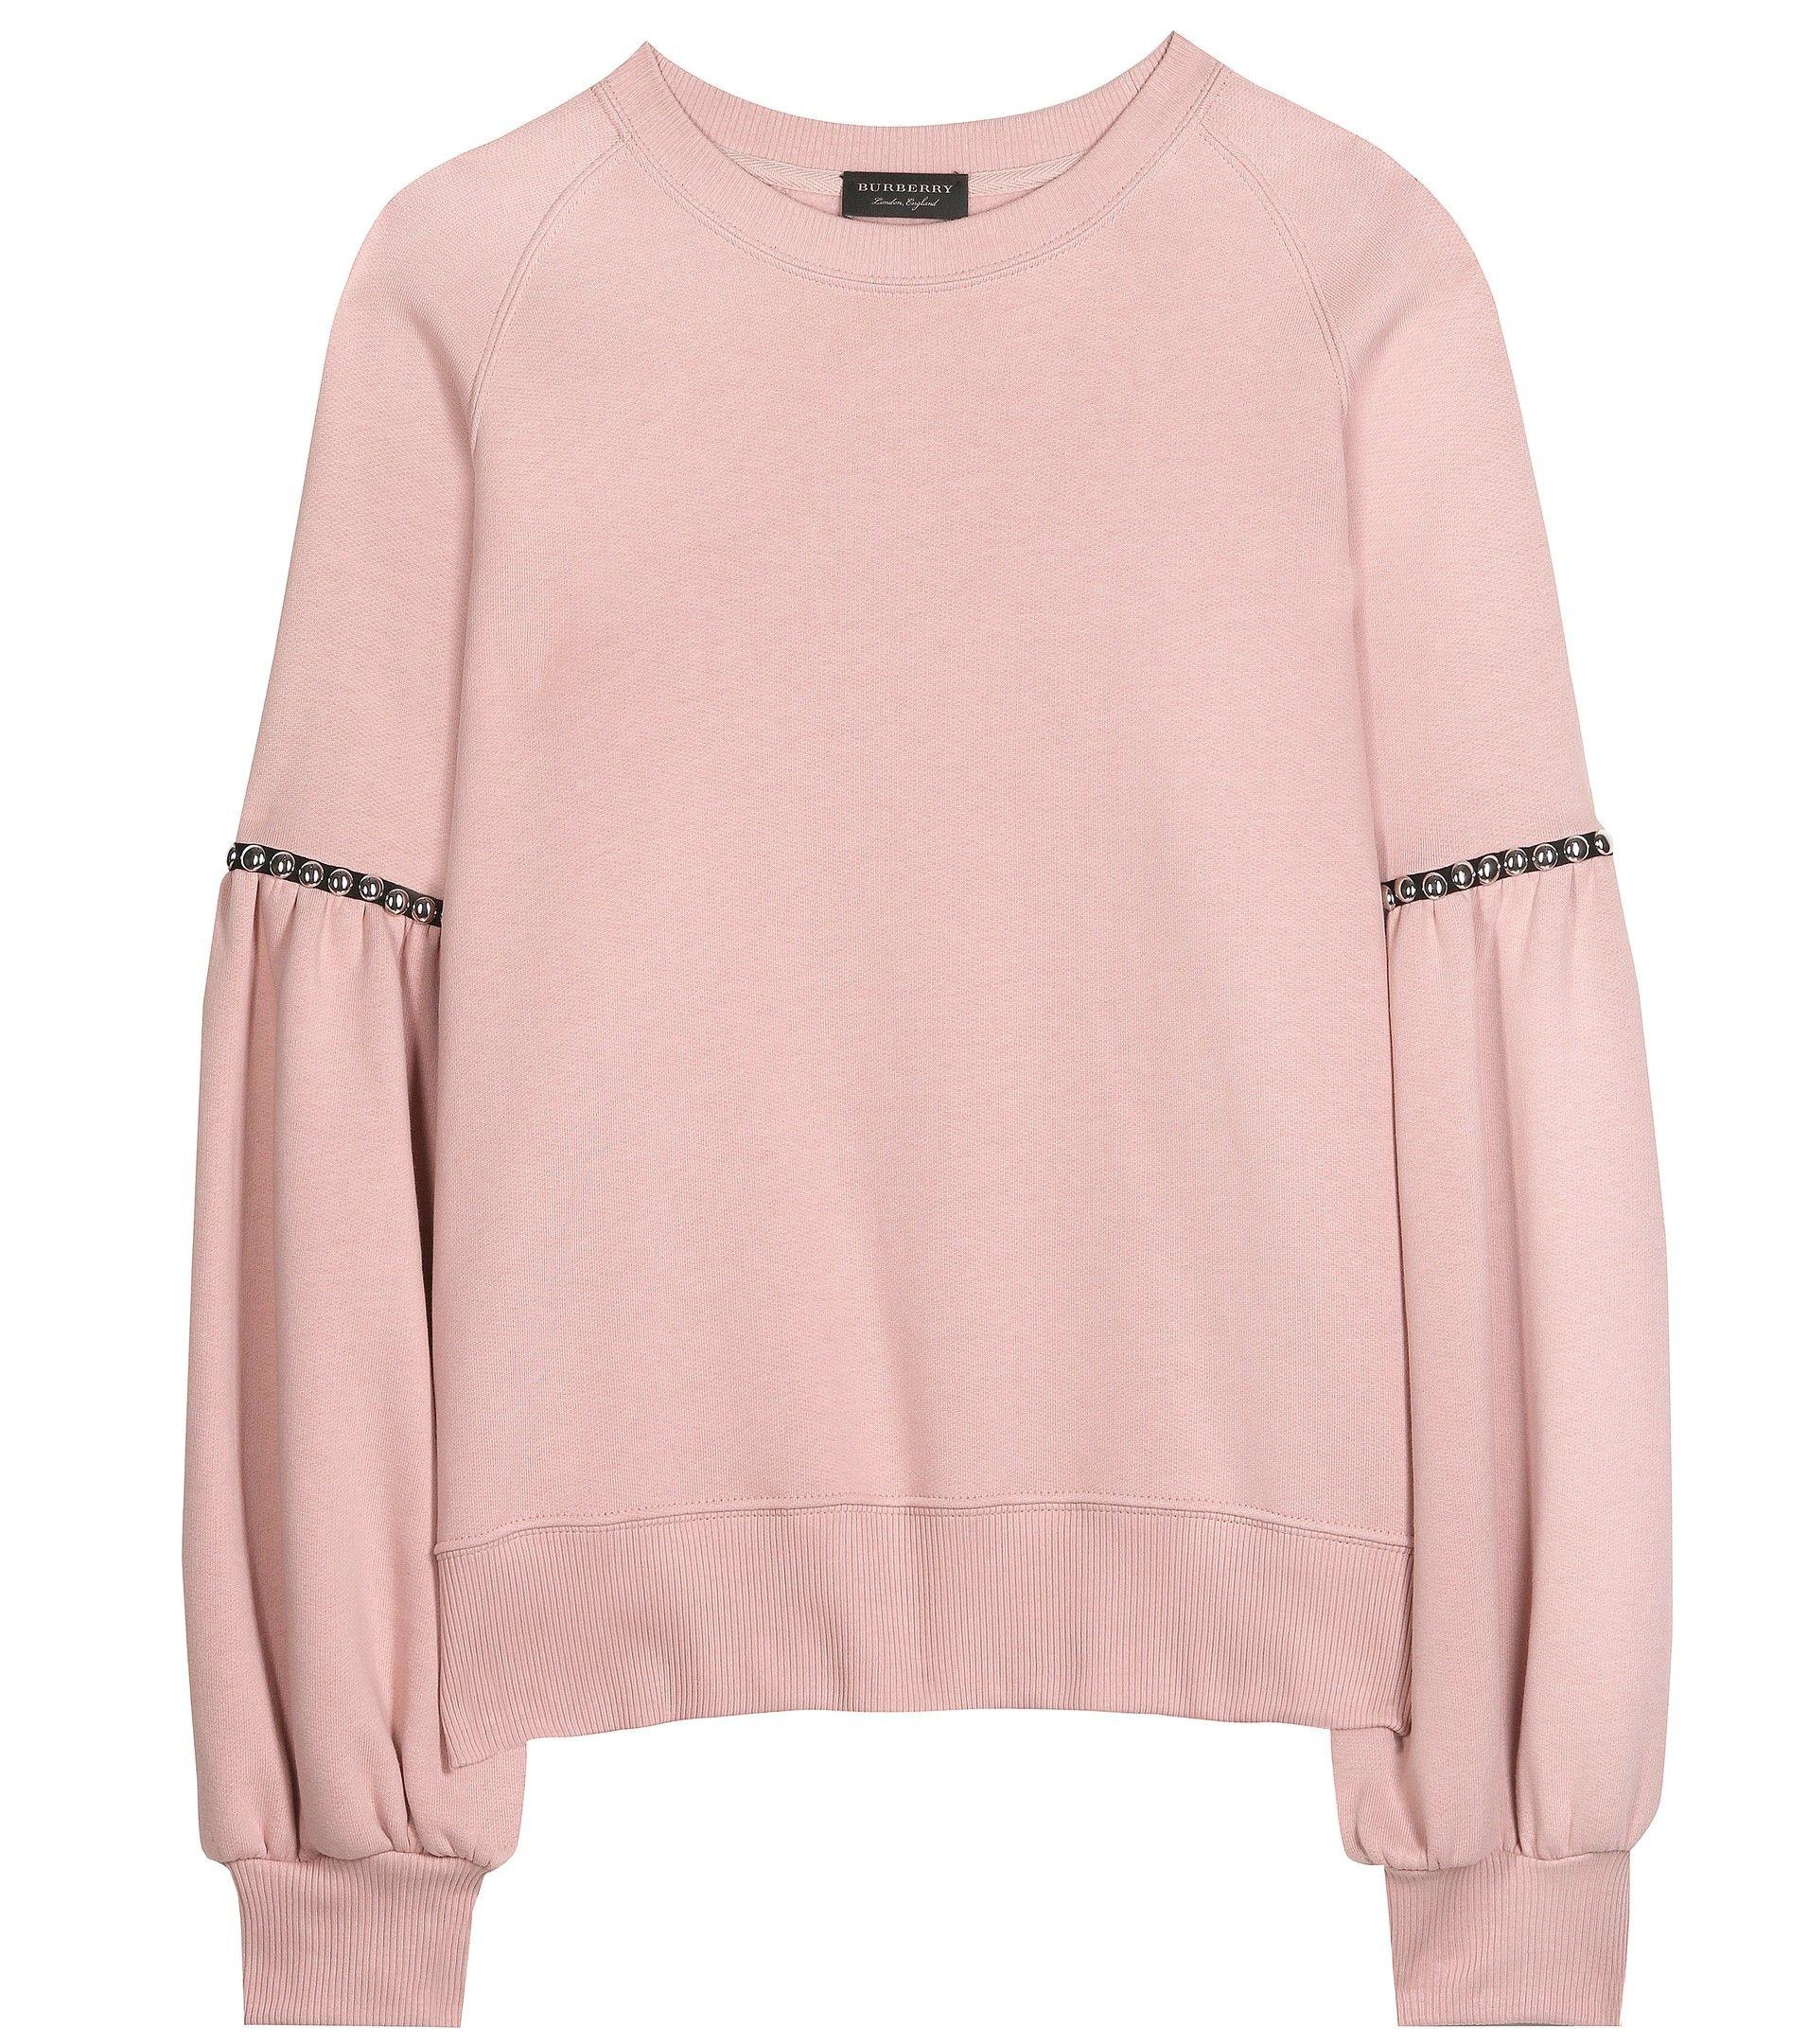 5631d5634ed9 mytheresa.com - Embellished sweater - Burberry - Designers - Luxury Fashion  for Women /